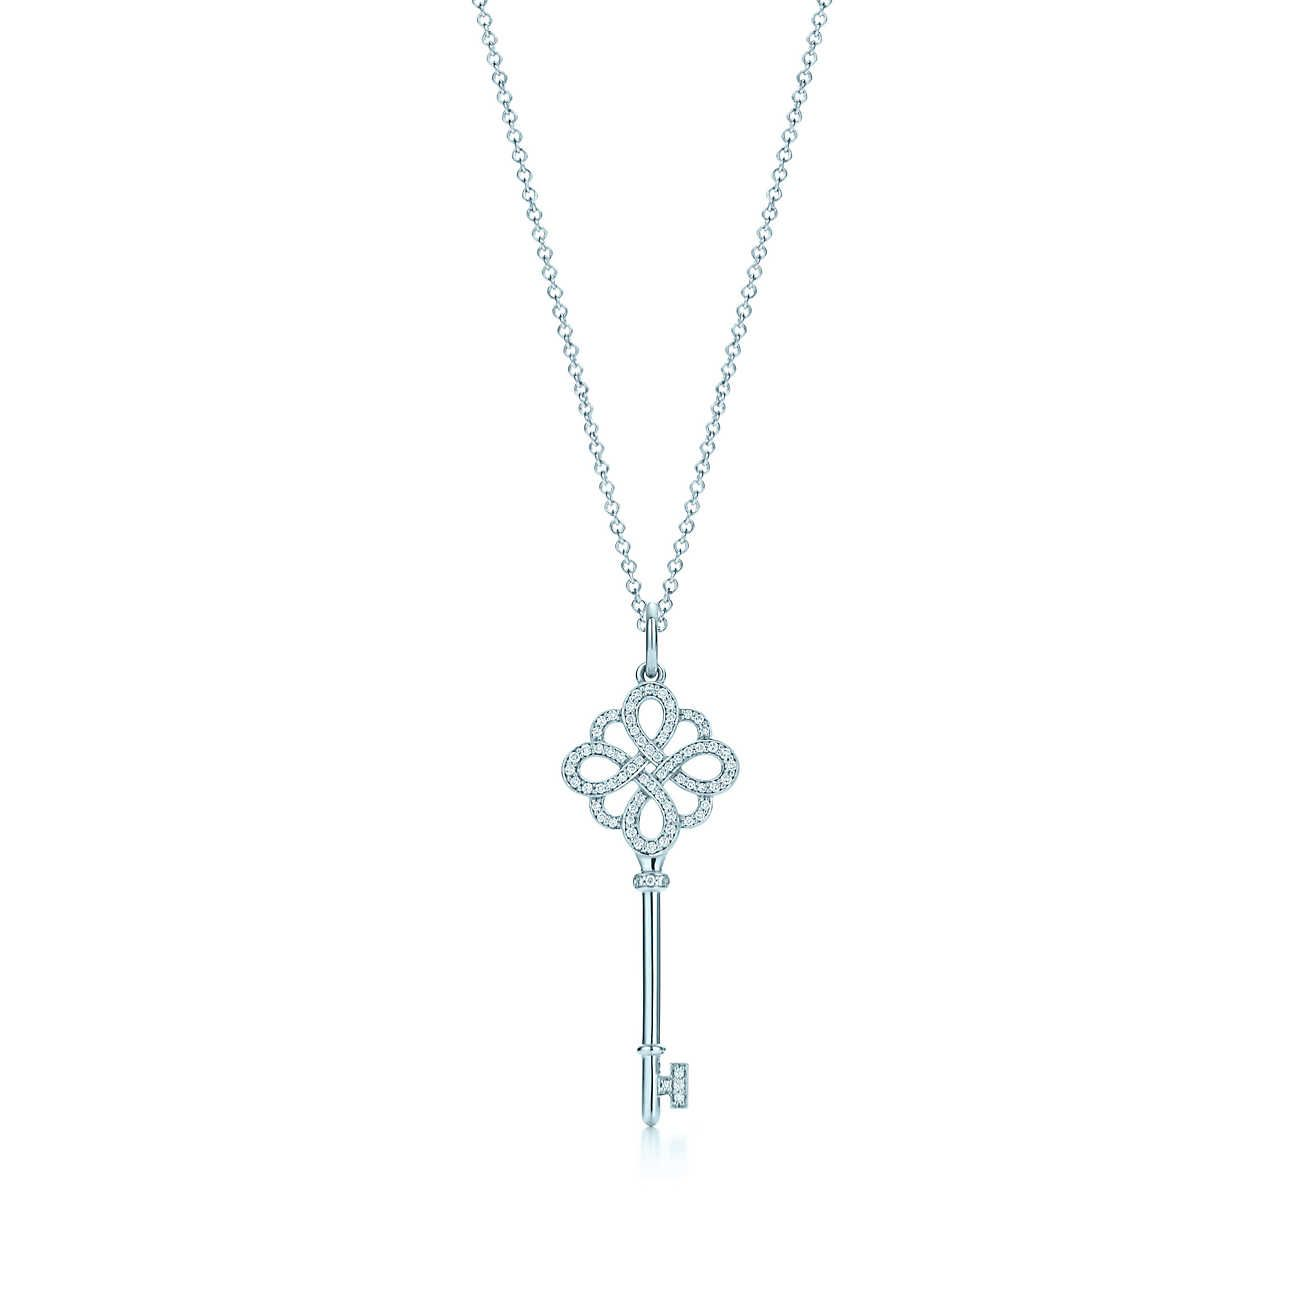 7819a422f22c0 Tiffany Keys Knot Key Pendant in 2019   Accessories Inspiration ...